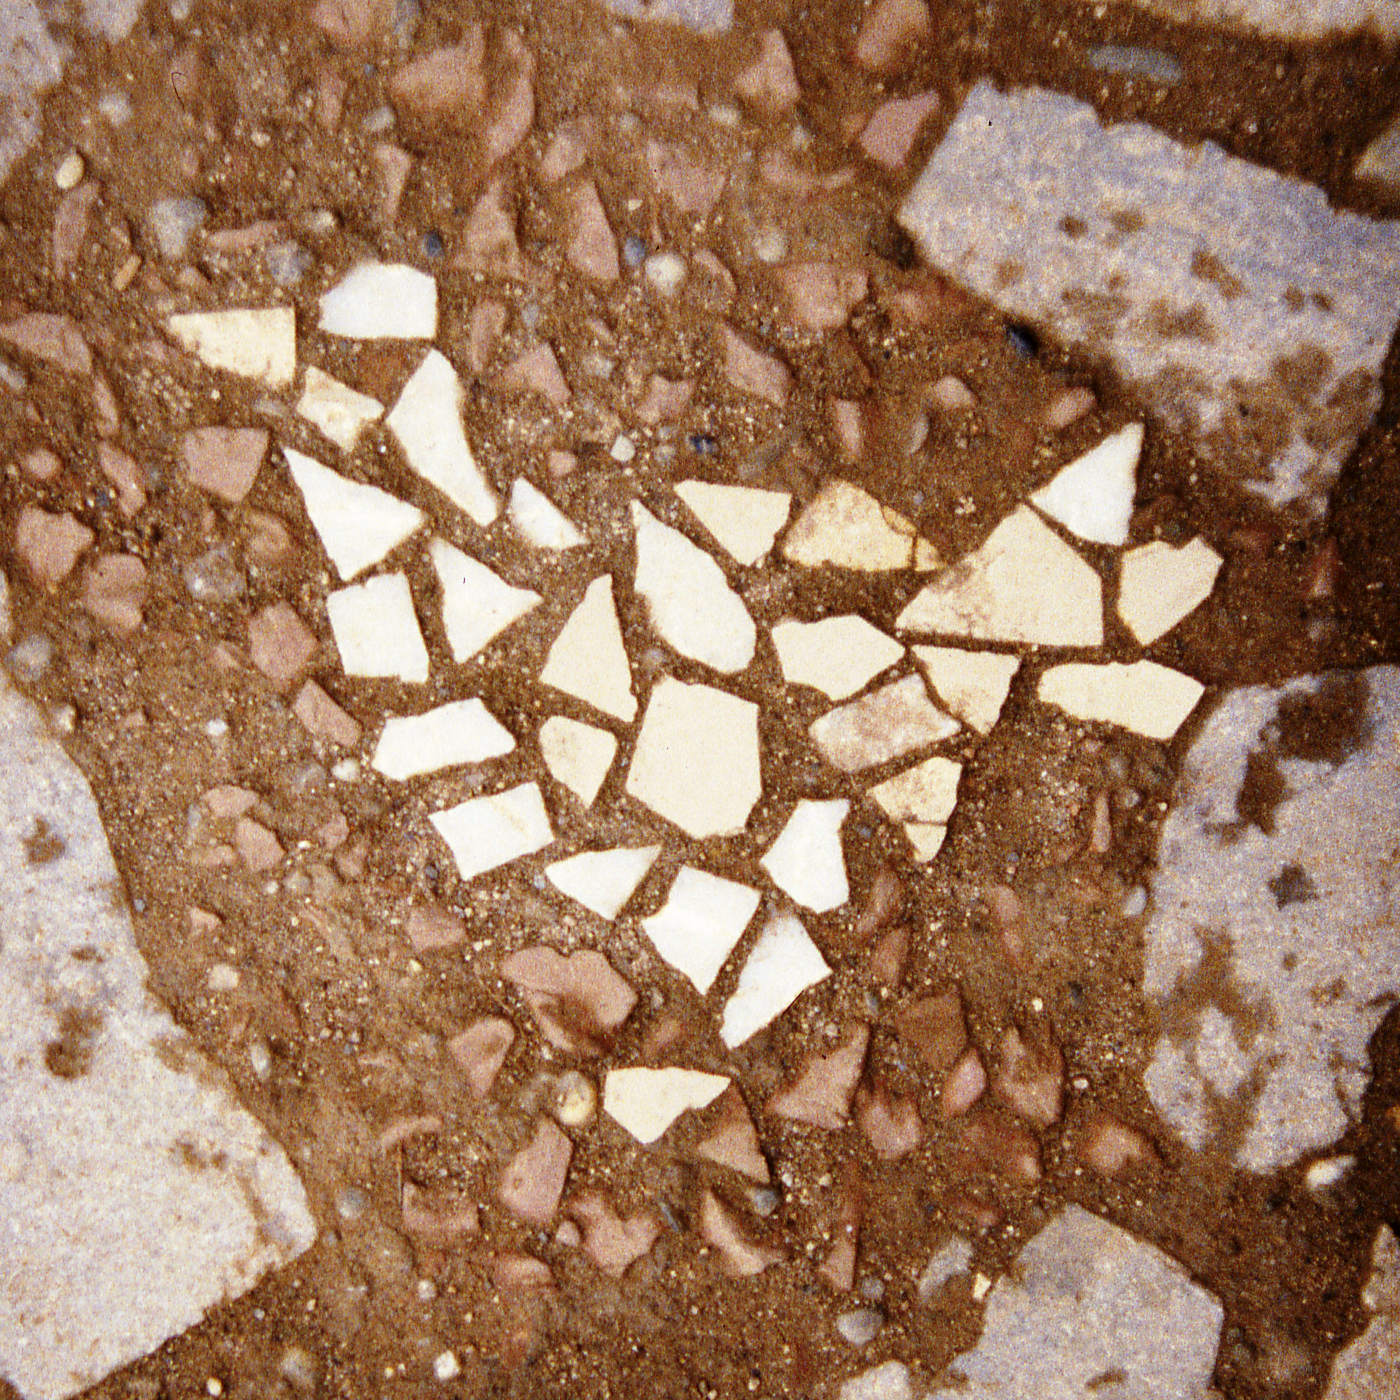 Ökogarten: Bodenmosaik aus Recyclingmaterial (Gerhard Sihler, Frieder Bayer)